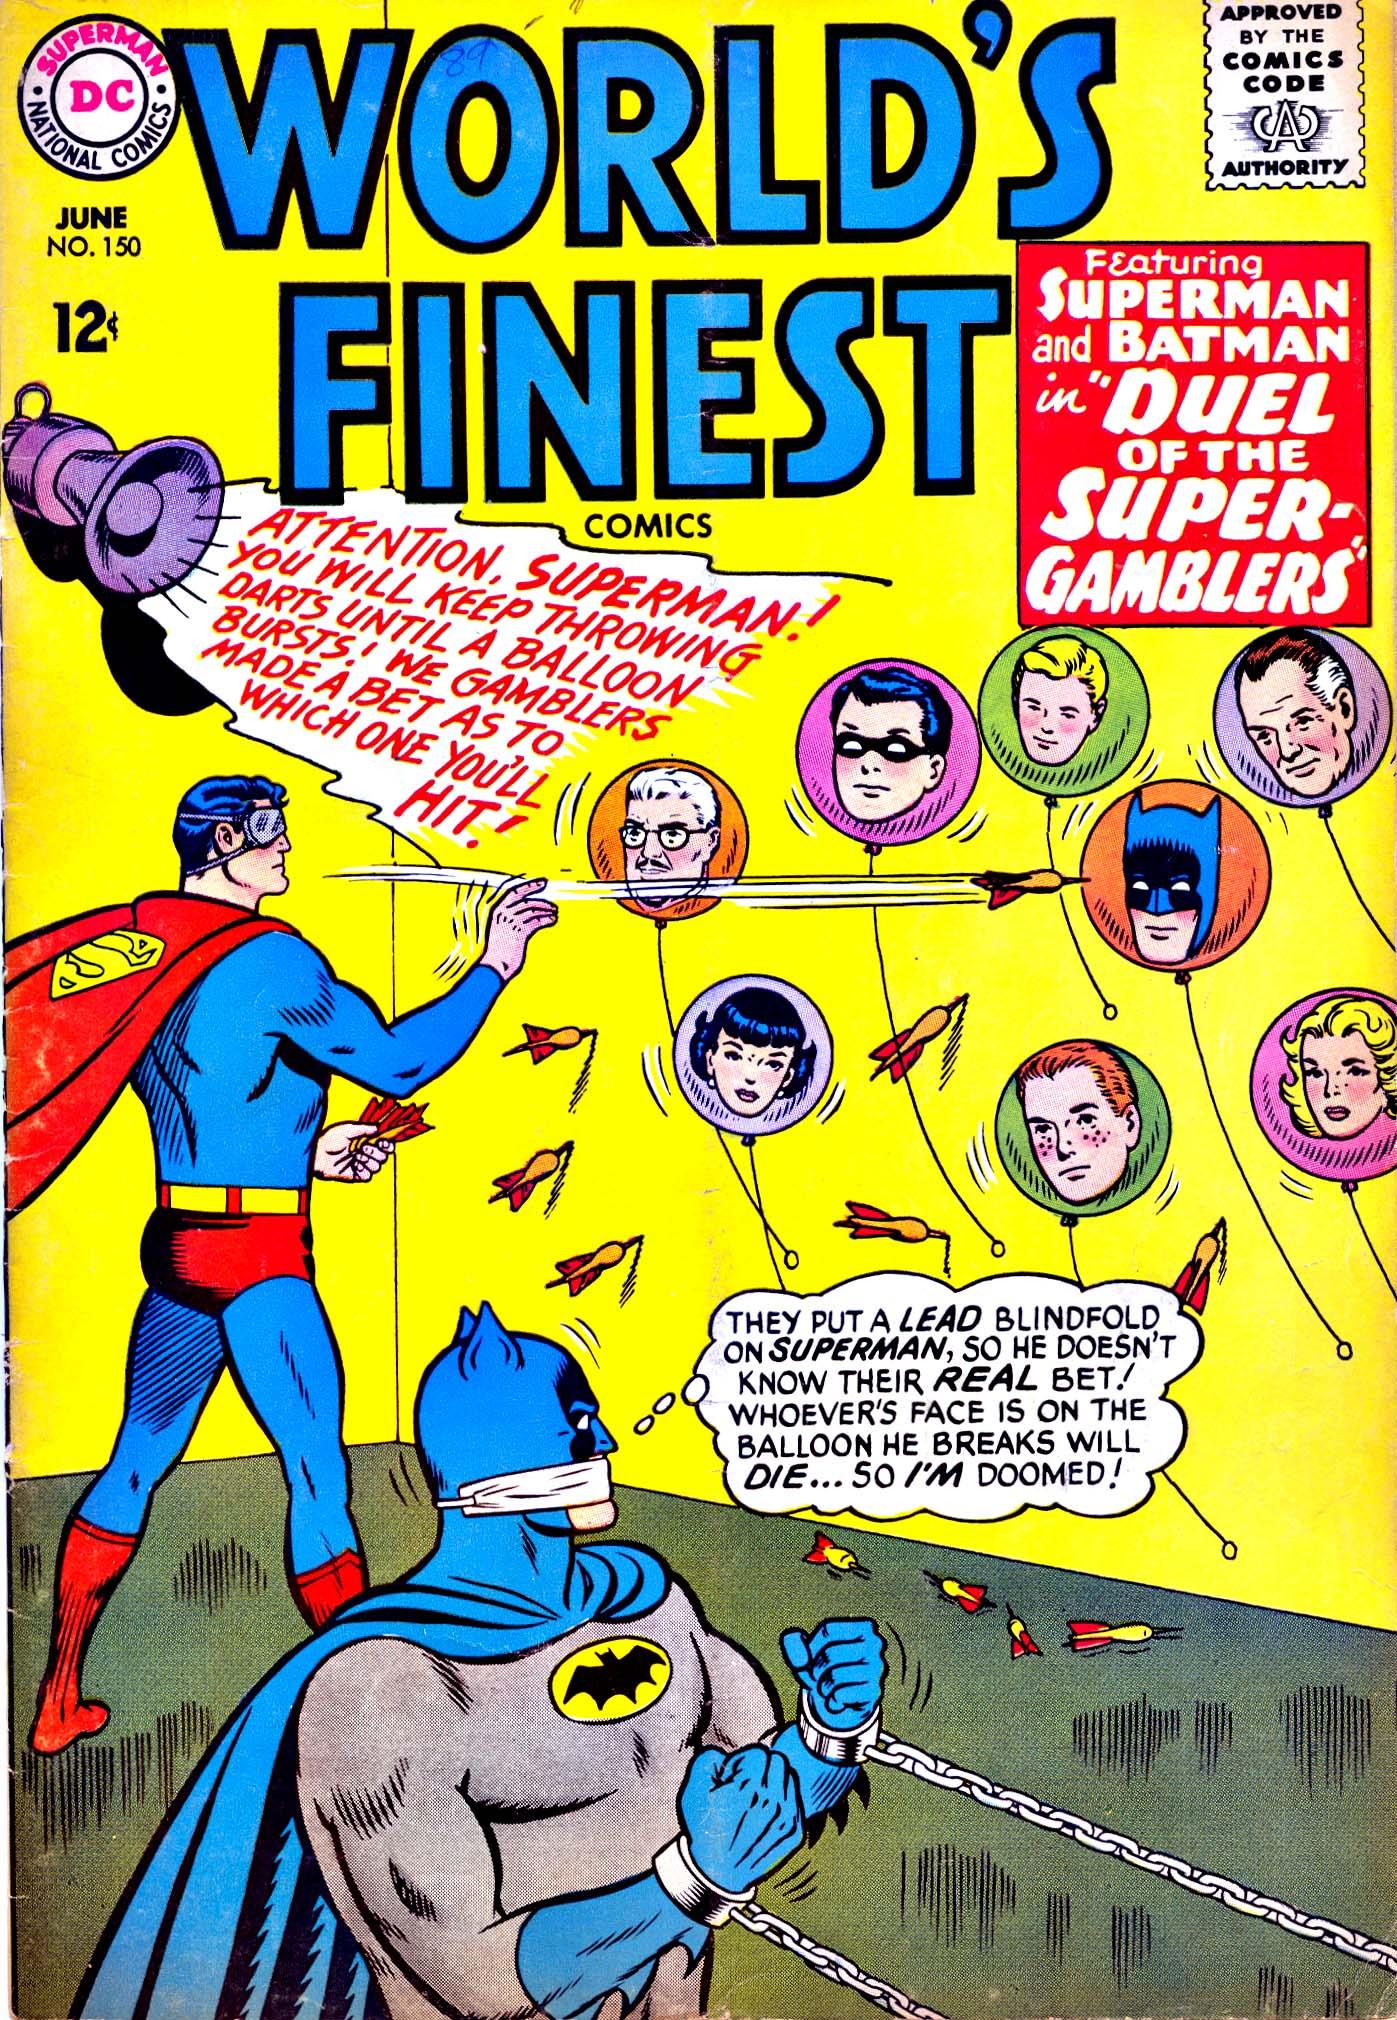 Read online World's Finest Comics comic -  Issue #150 - 1